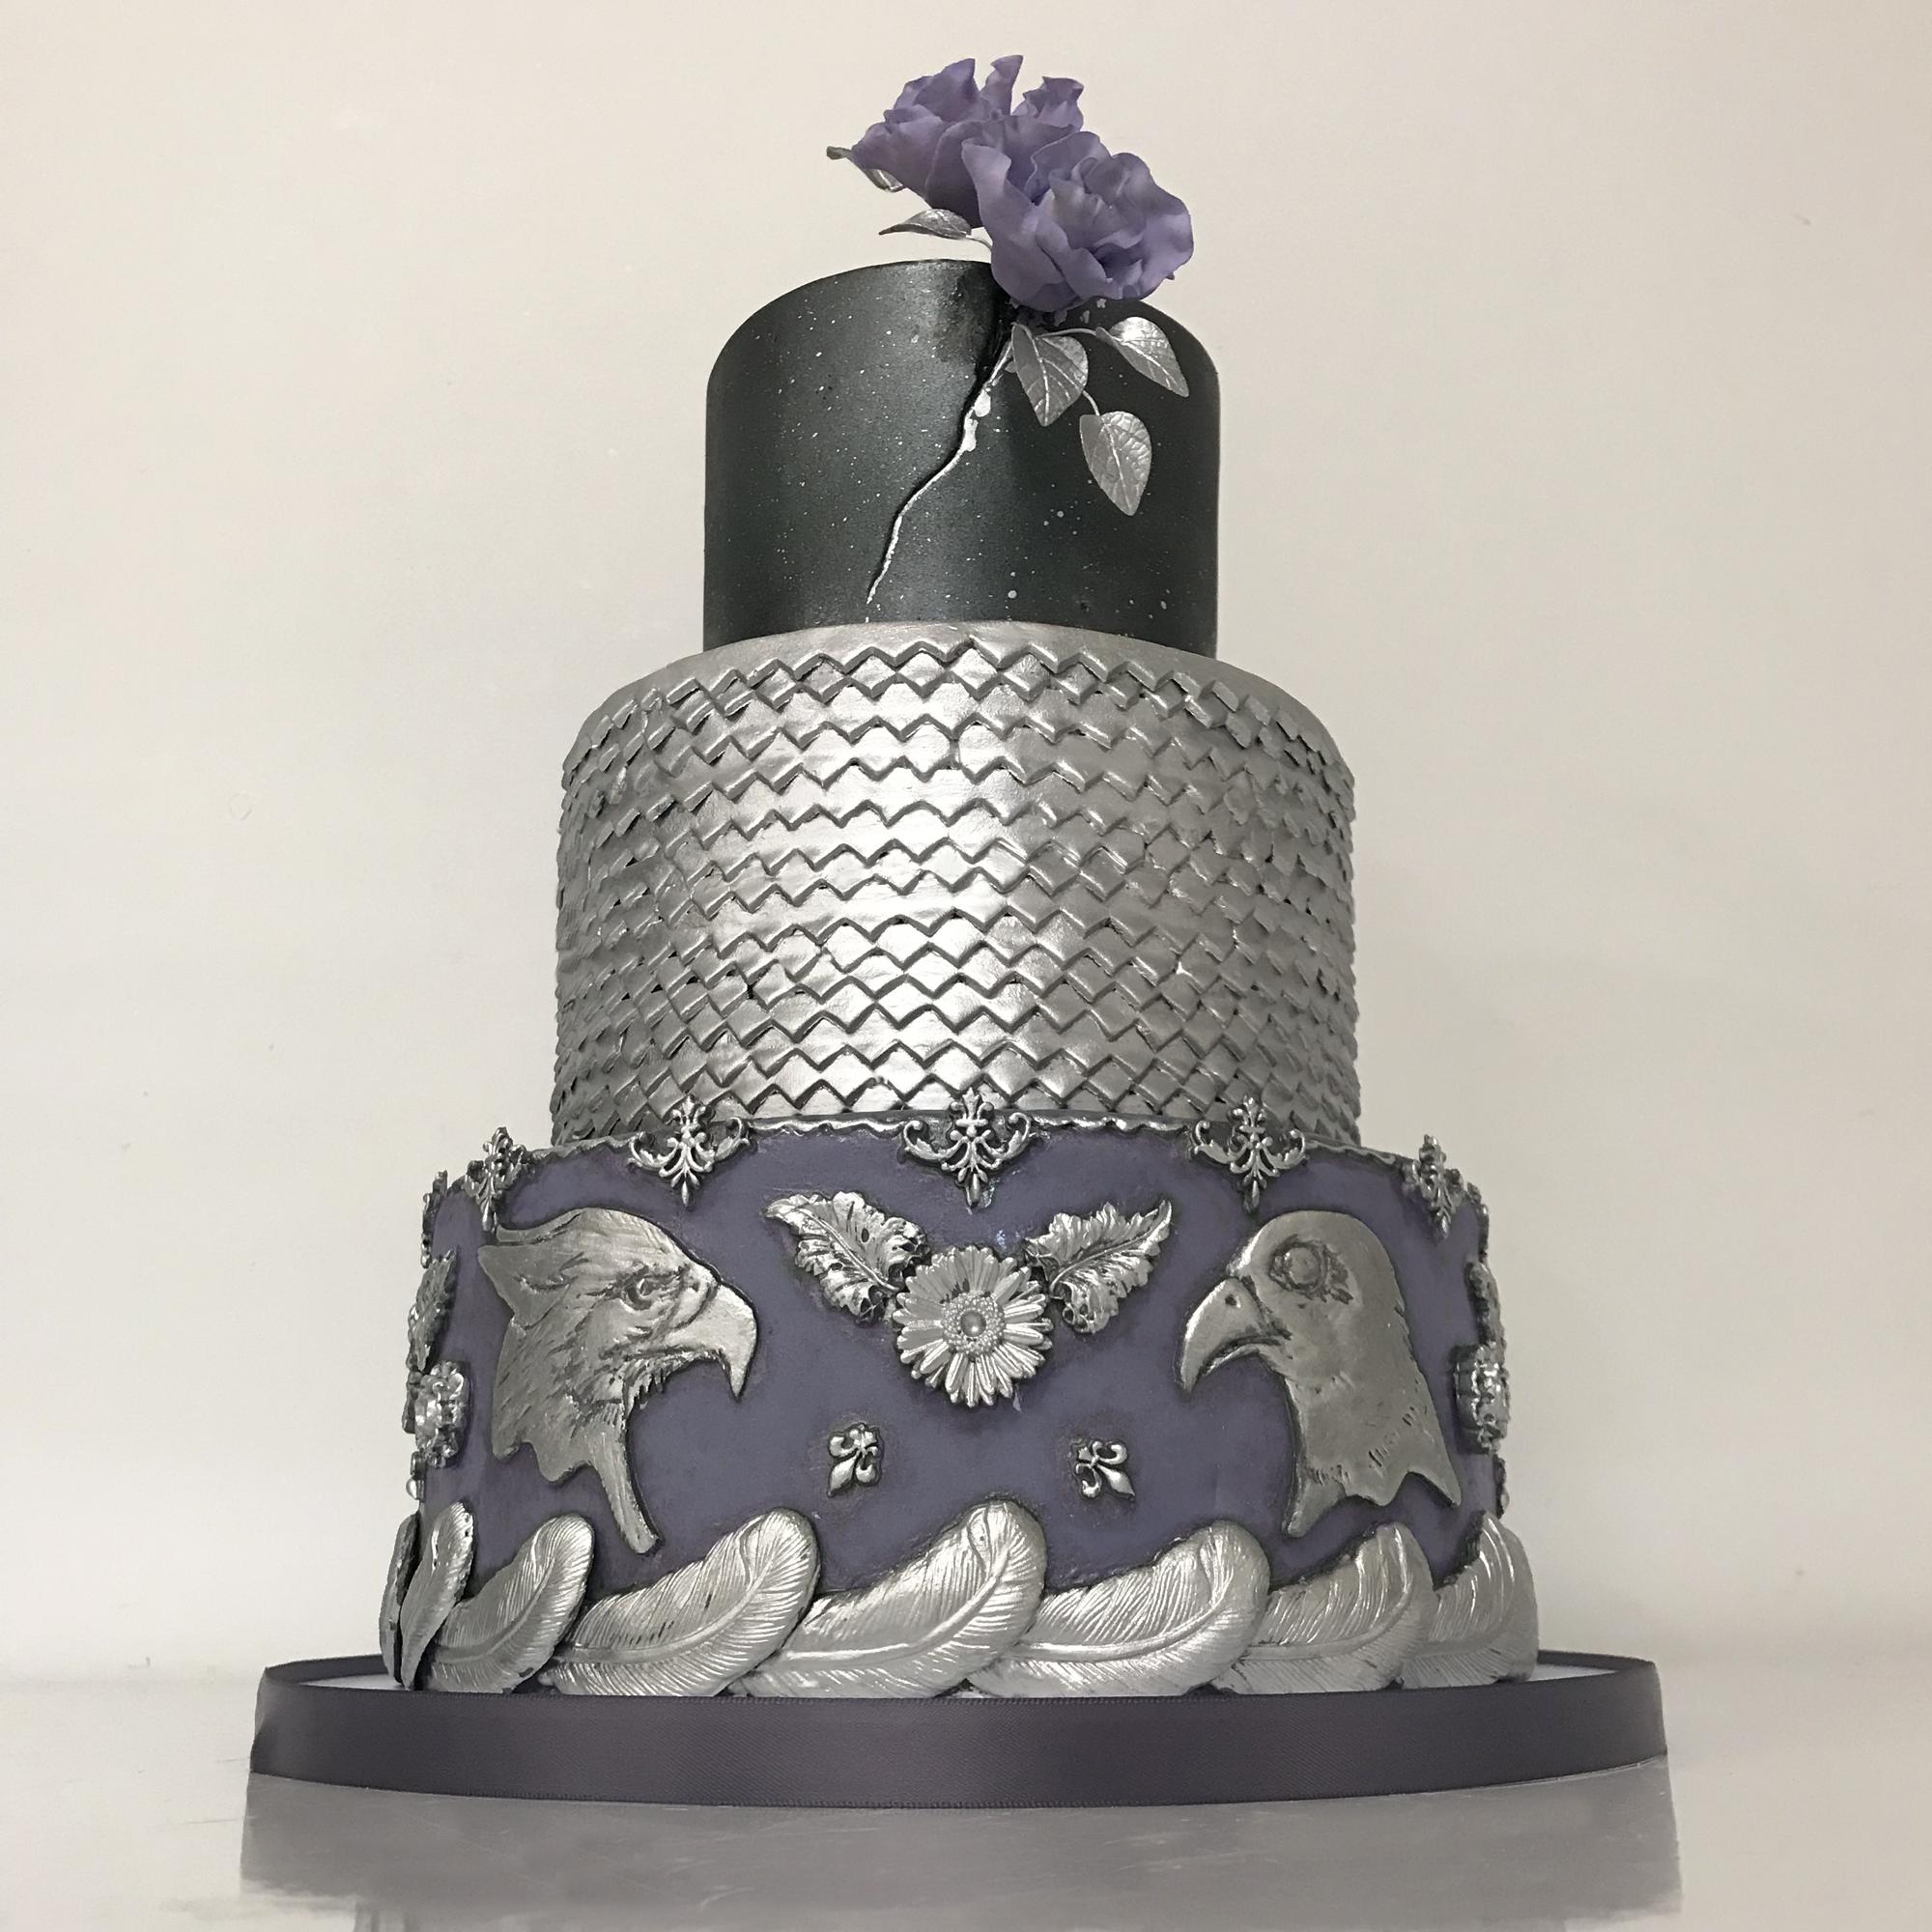 Game of Thrones Cake.jpg